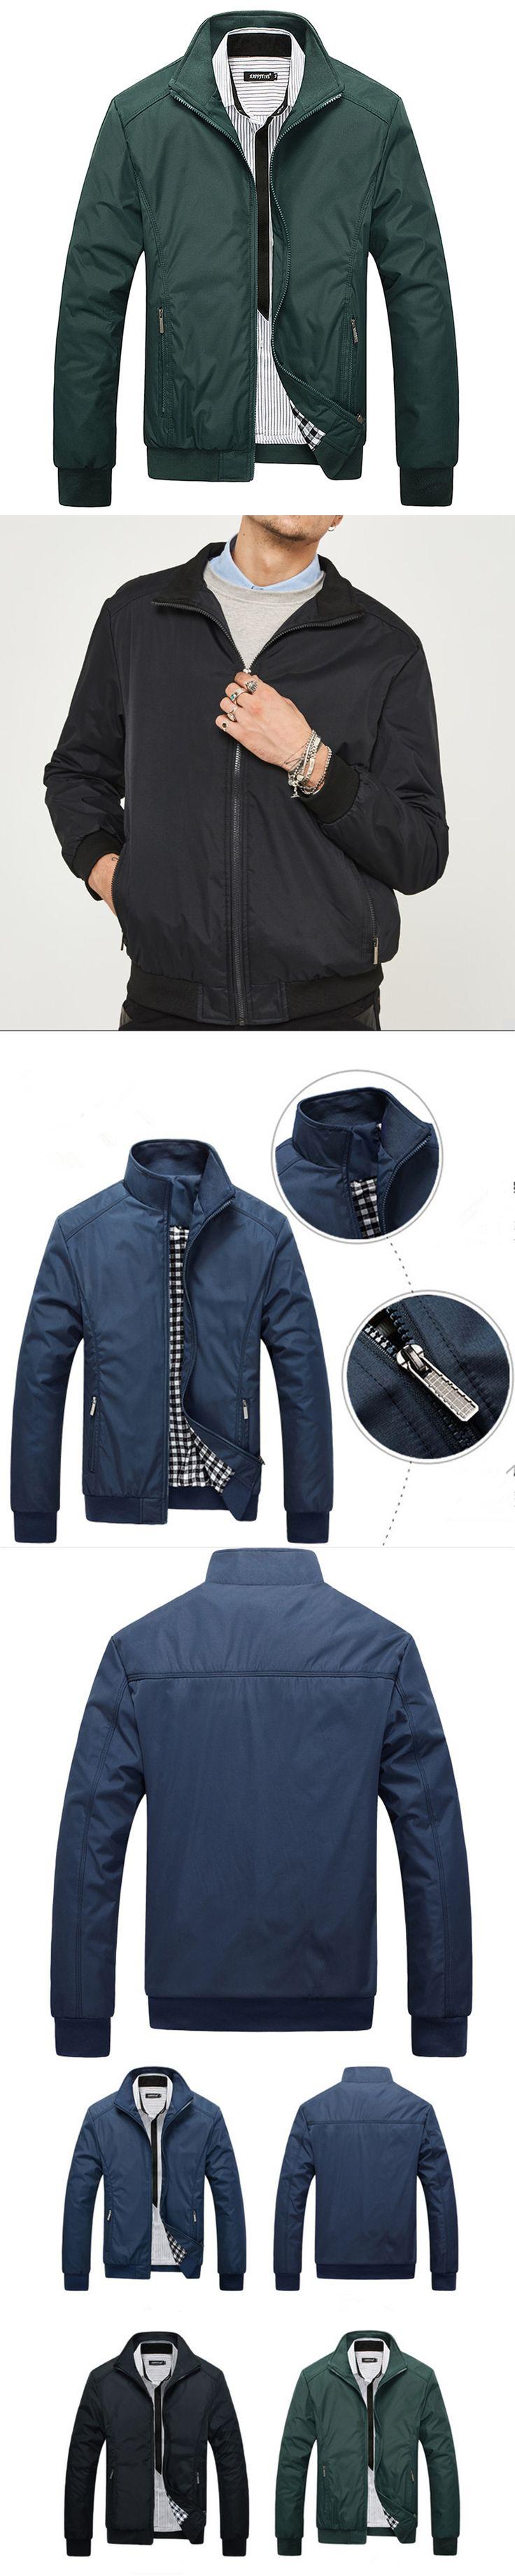 Men's Fashion Casual New Man Mandarin Collar Jacket Autumn Male Jacket Overcoat Clothing